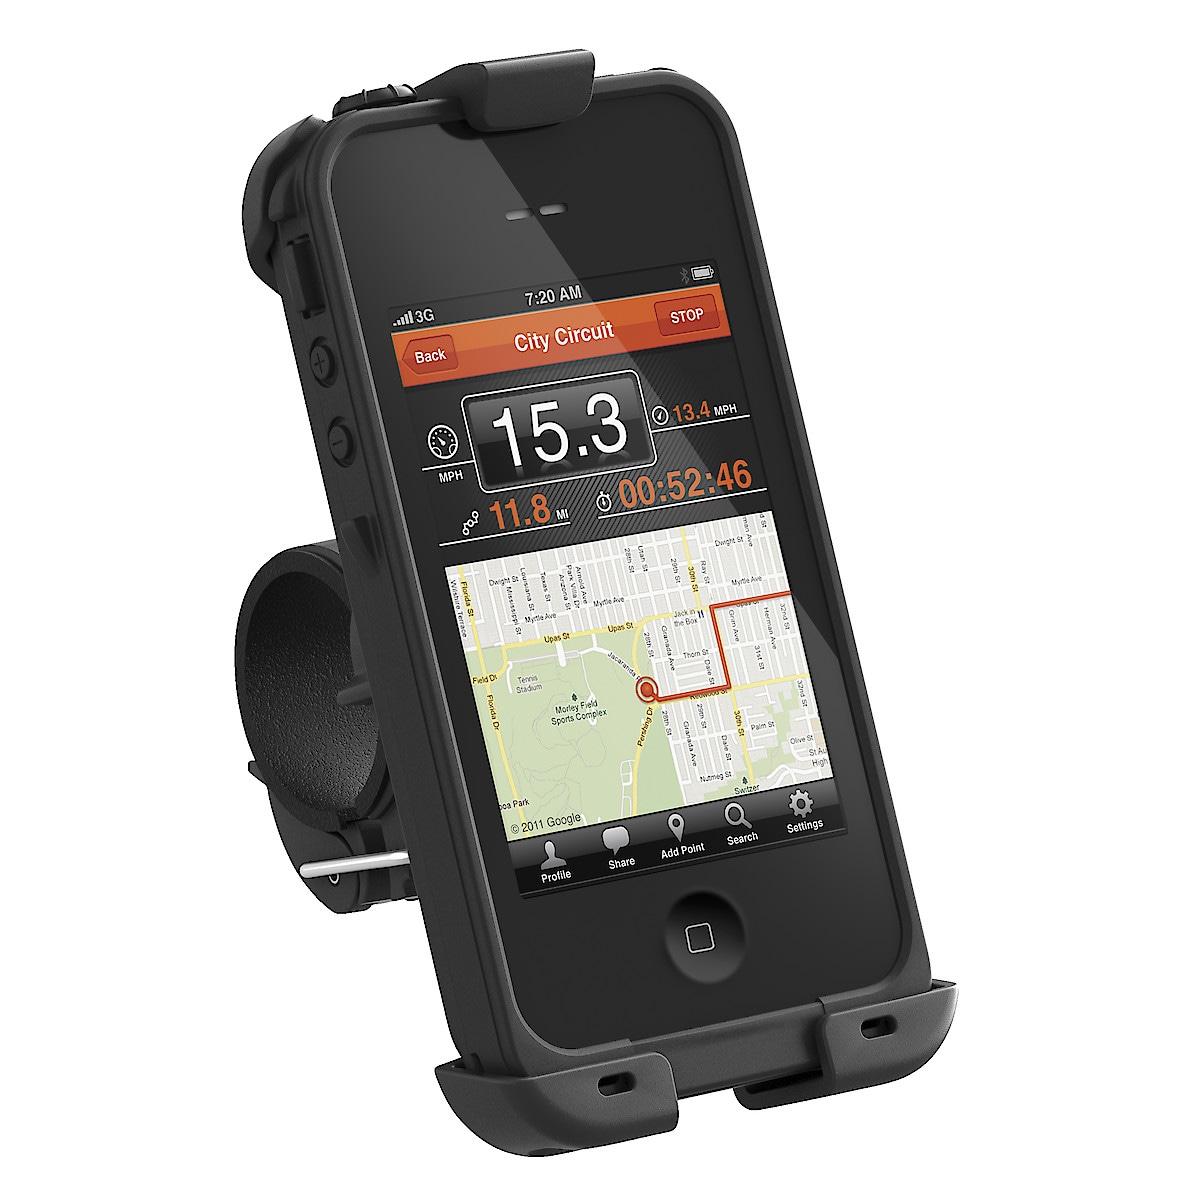 Cykelfäste för iPhone 4/4S Lifeproof